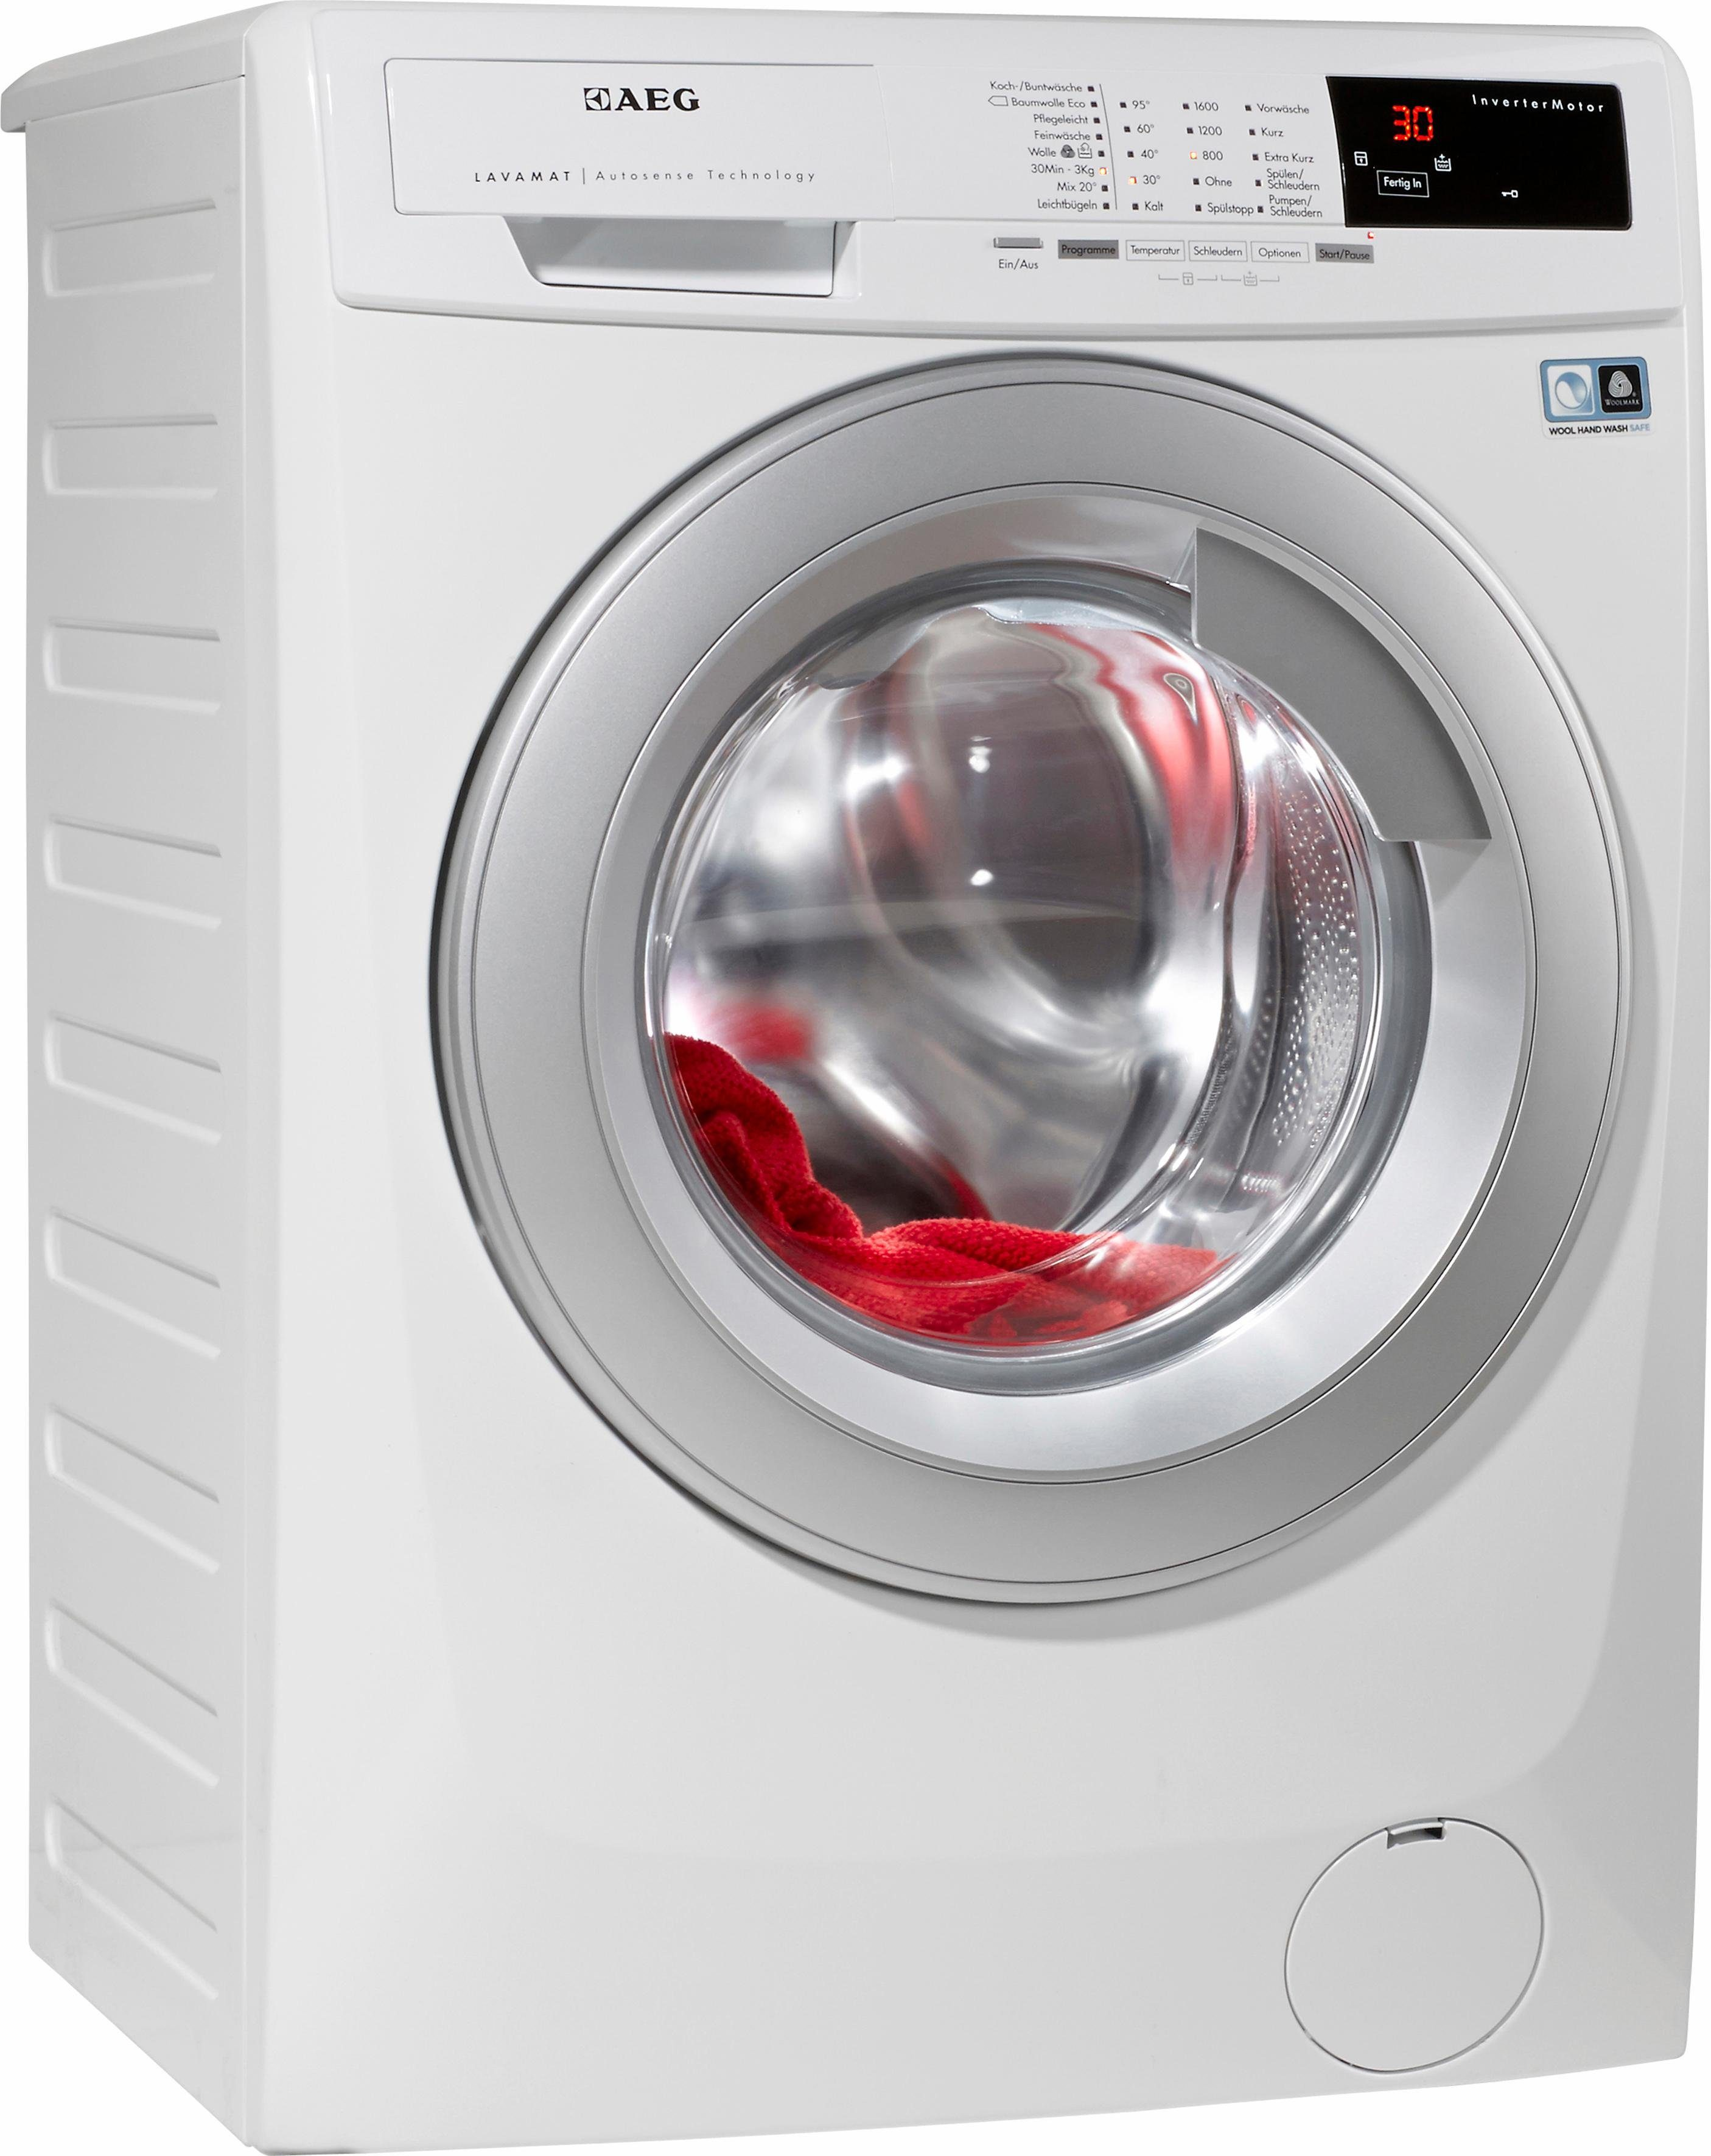 AEG Waschmaschine LAVAMAT L14AS8, A+++, 8 kg, 1400 U/Min